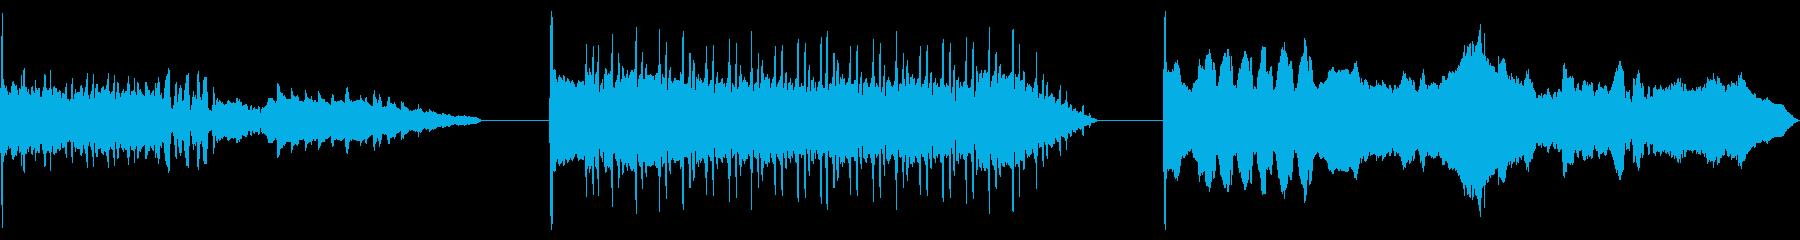 DIDGERIDOO、MEDIUM...の再生済みの波形